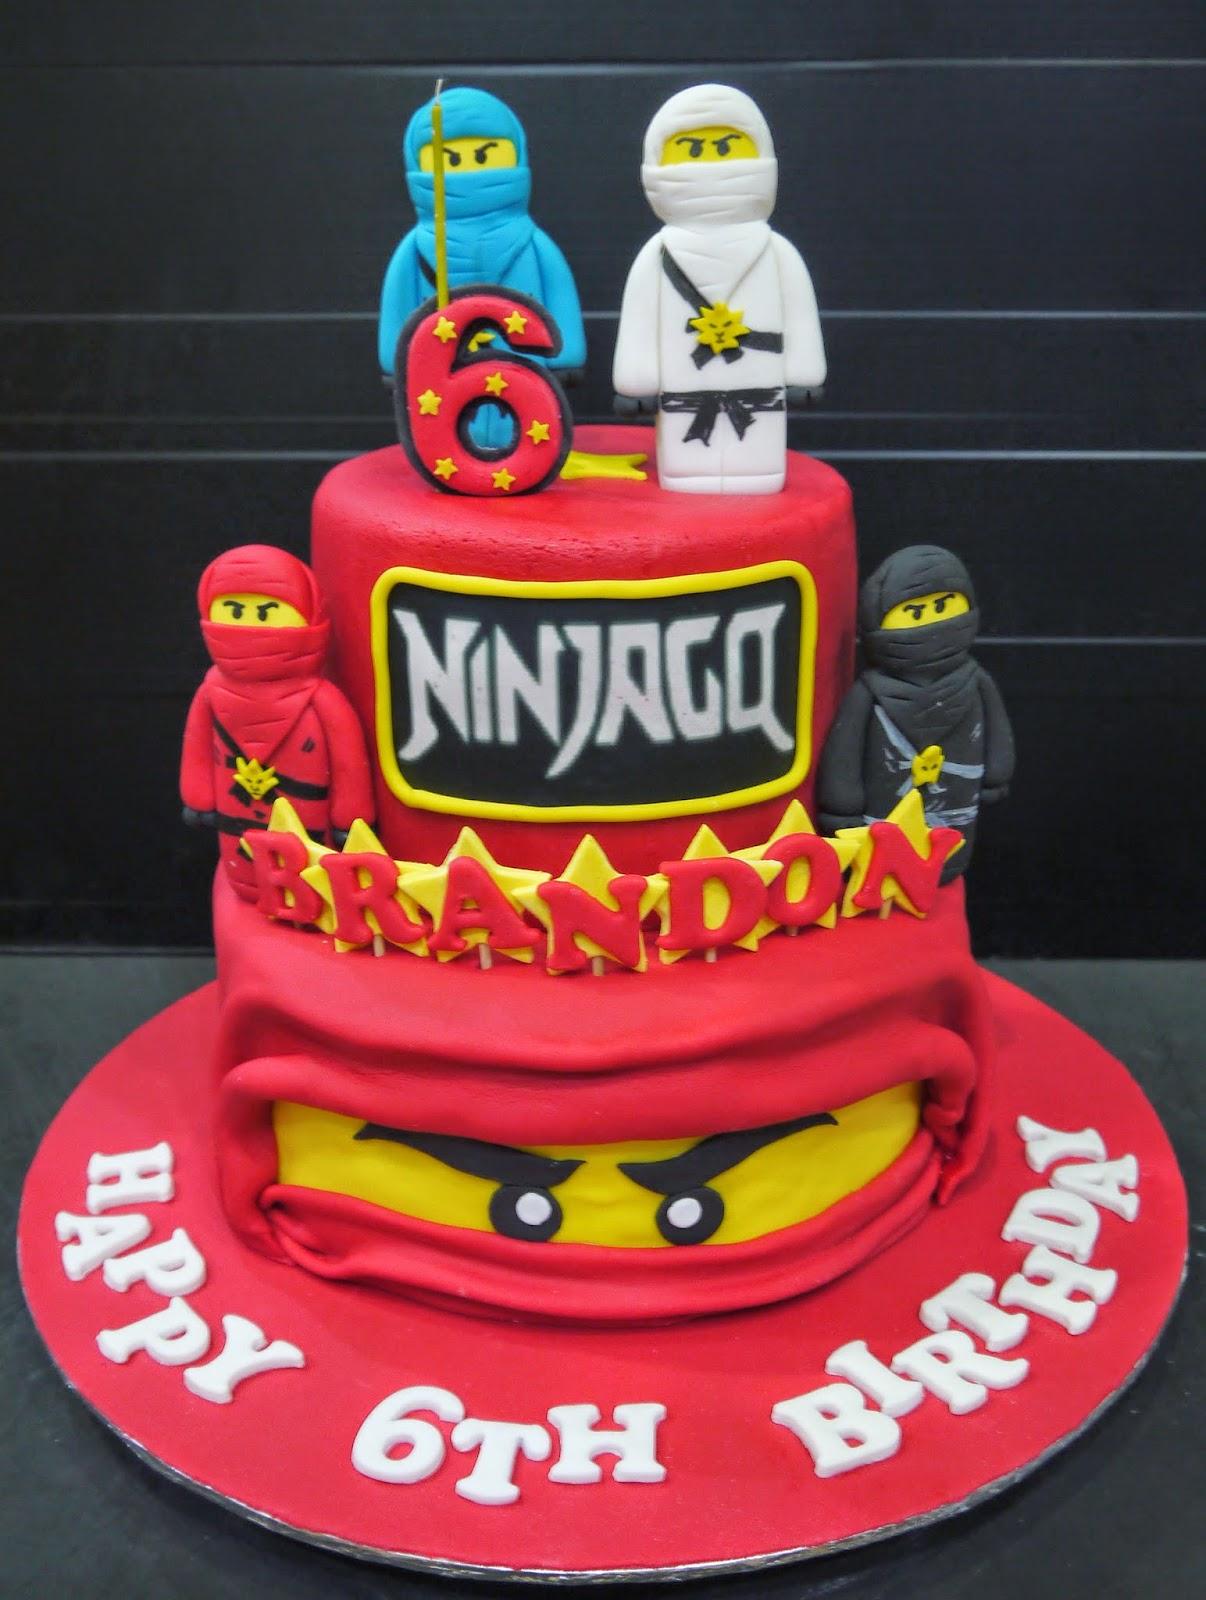 Cake Decoration Ninjago : Cupcake Divinity: Brandon s Ninjago cake